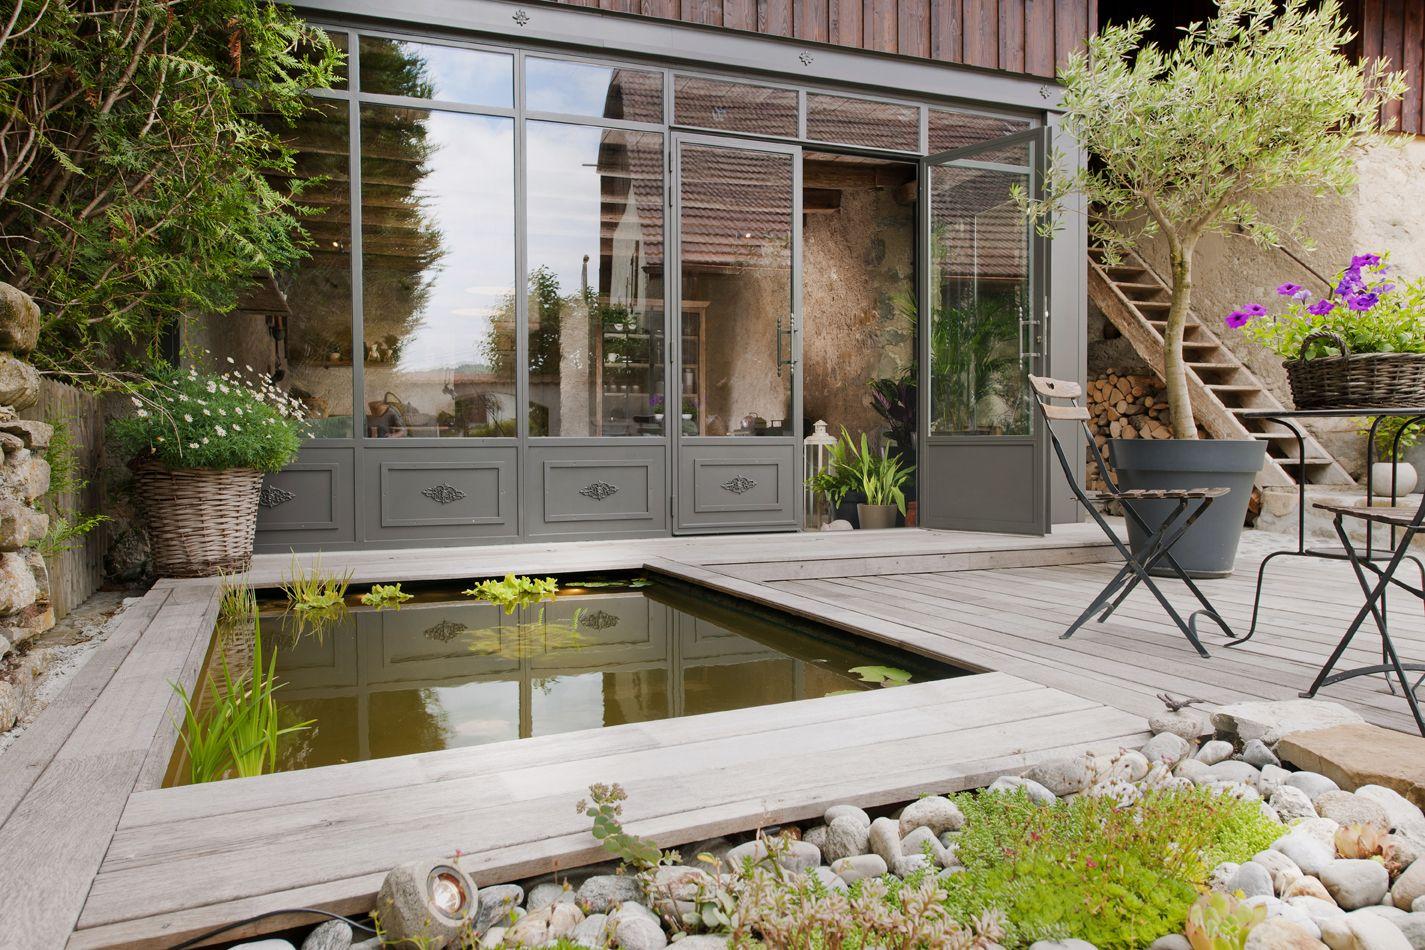 25+ bästa Lame de terrasse idéerna på Pinterest  Portail de maison, Lame ter